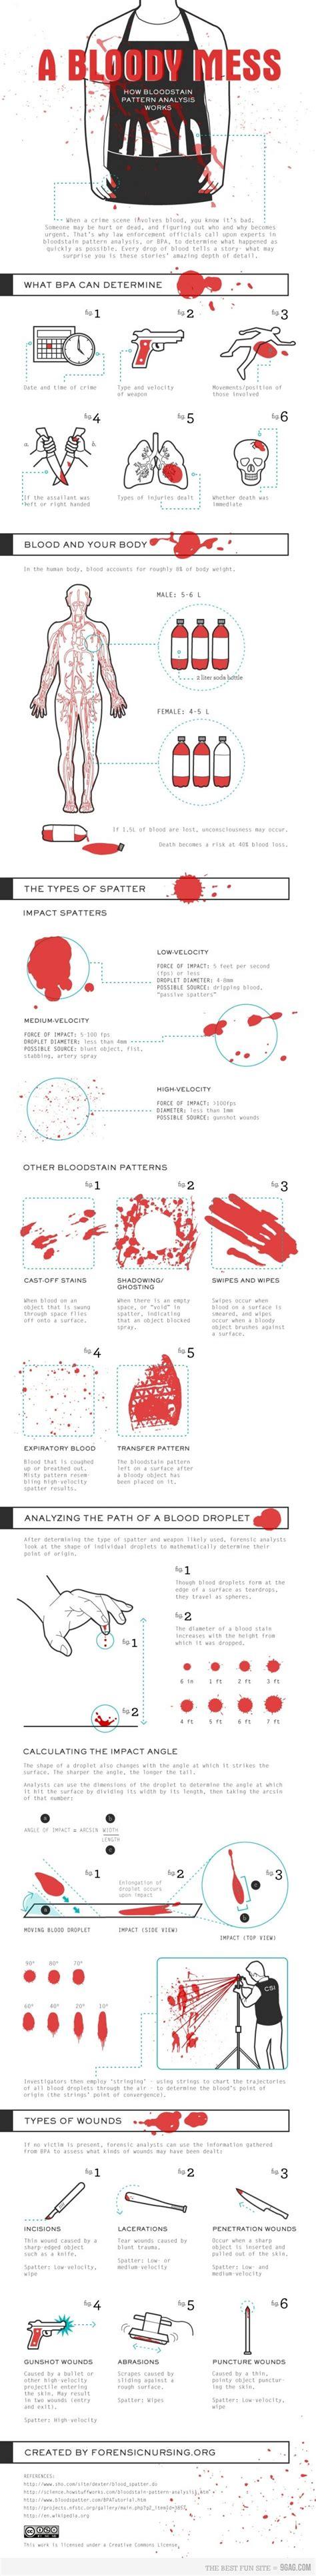 bloodstain pattern analysis how stuff works 3 ways to escape zip ties rebrn com